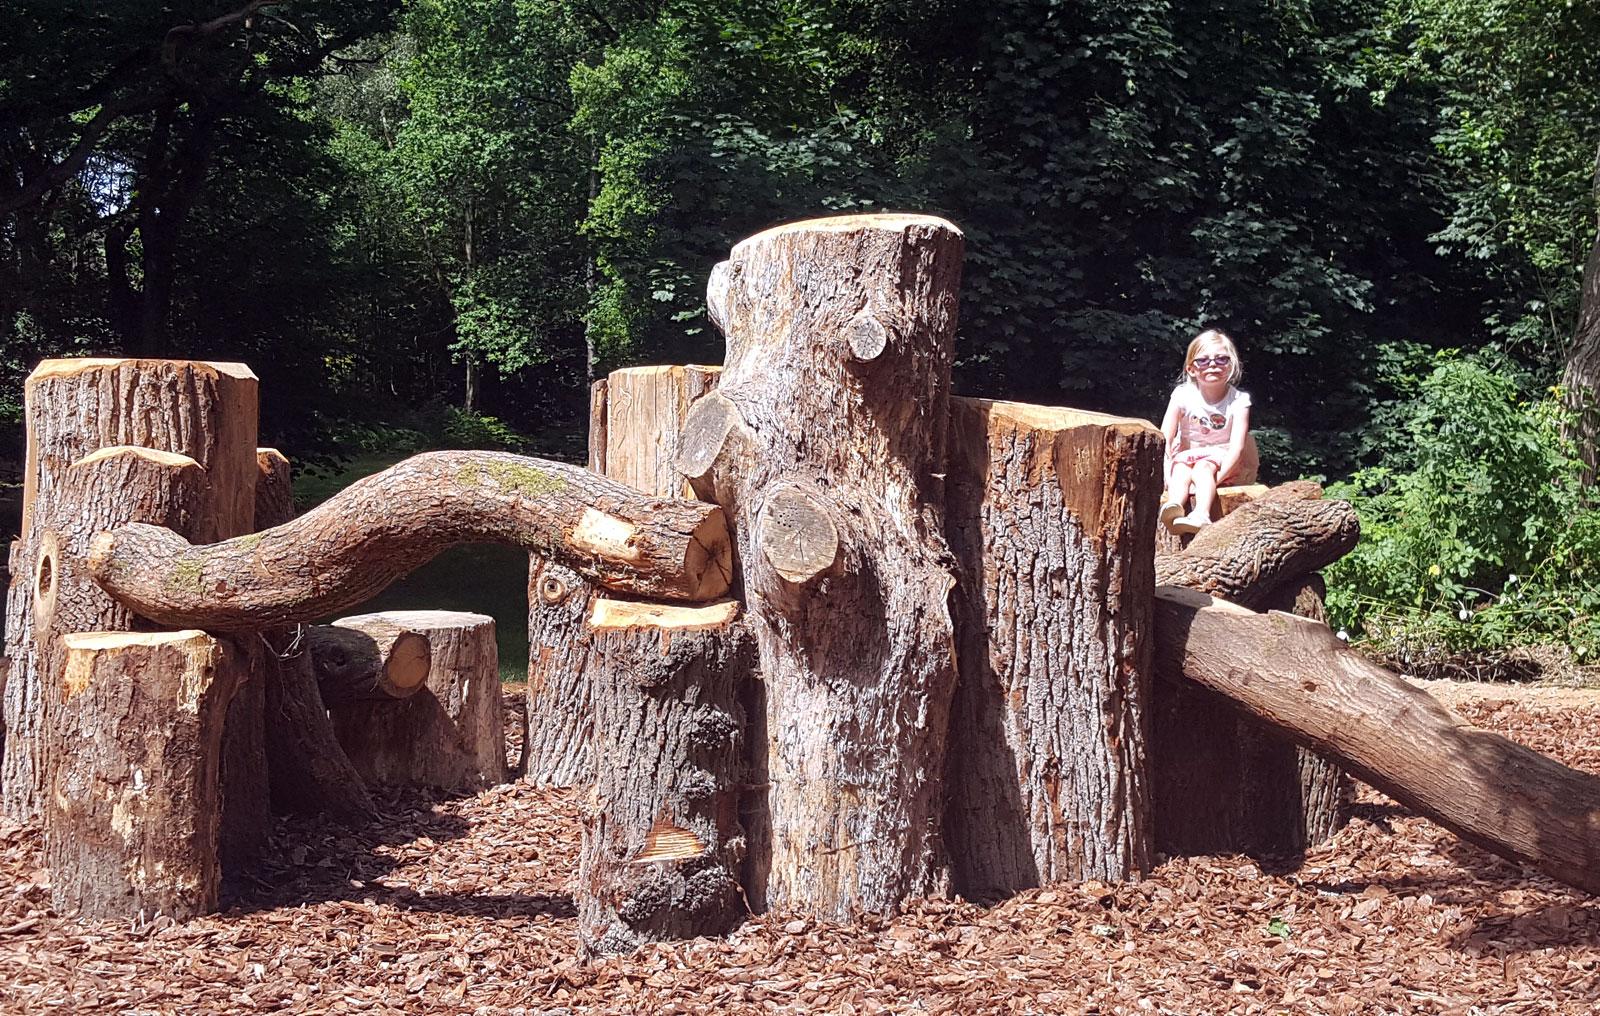 Wildwood Dens on Chorleywood Common